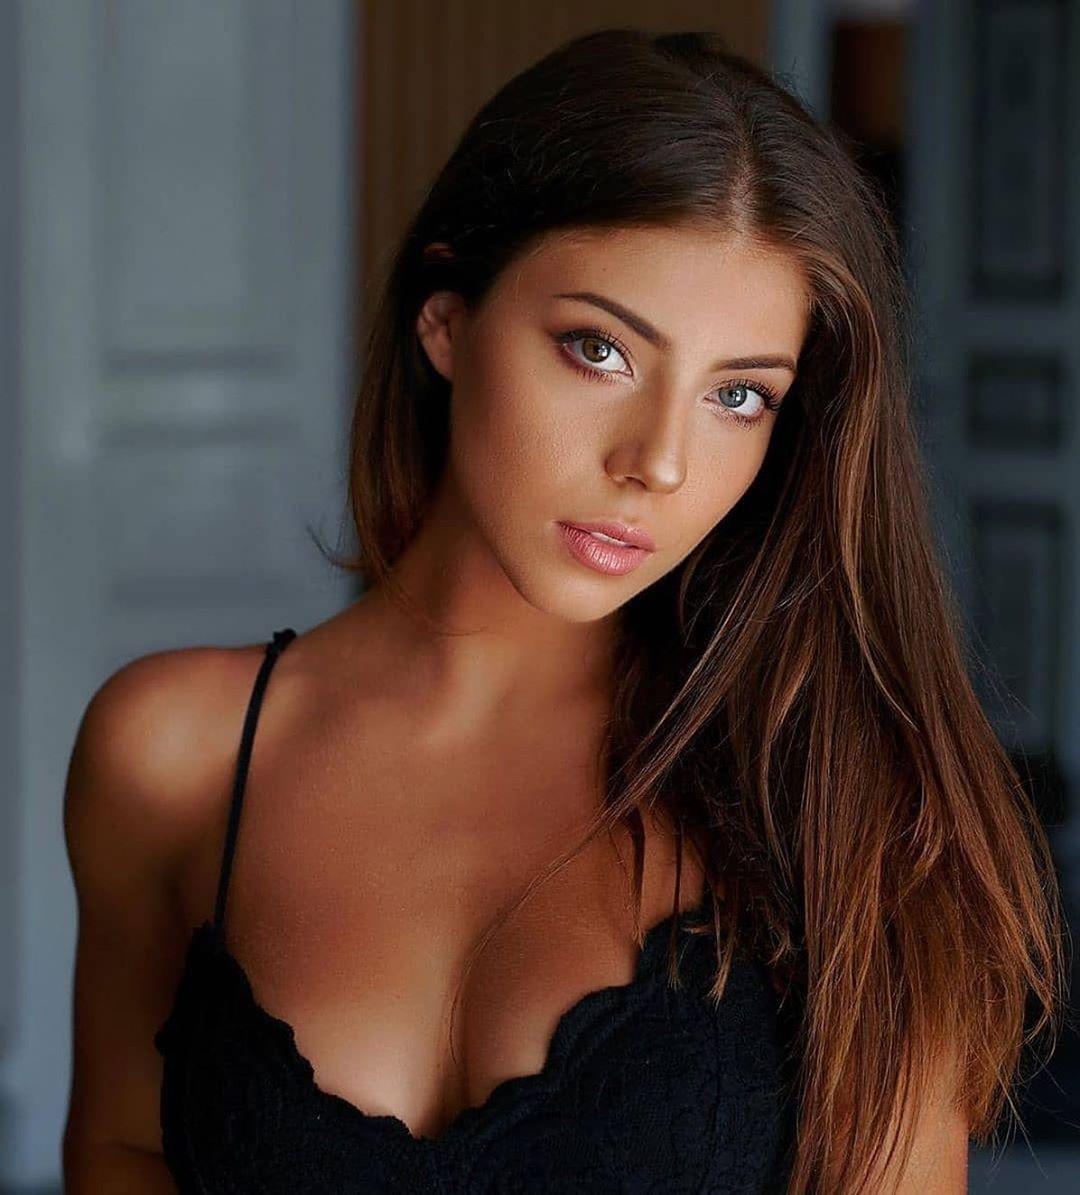 Natalia Gryglewska